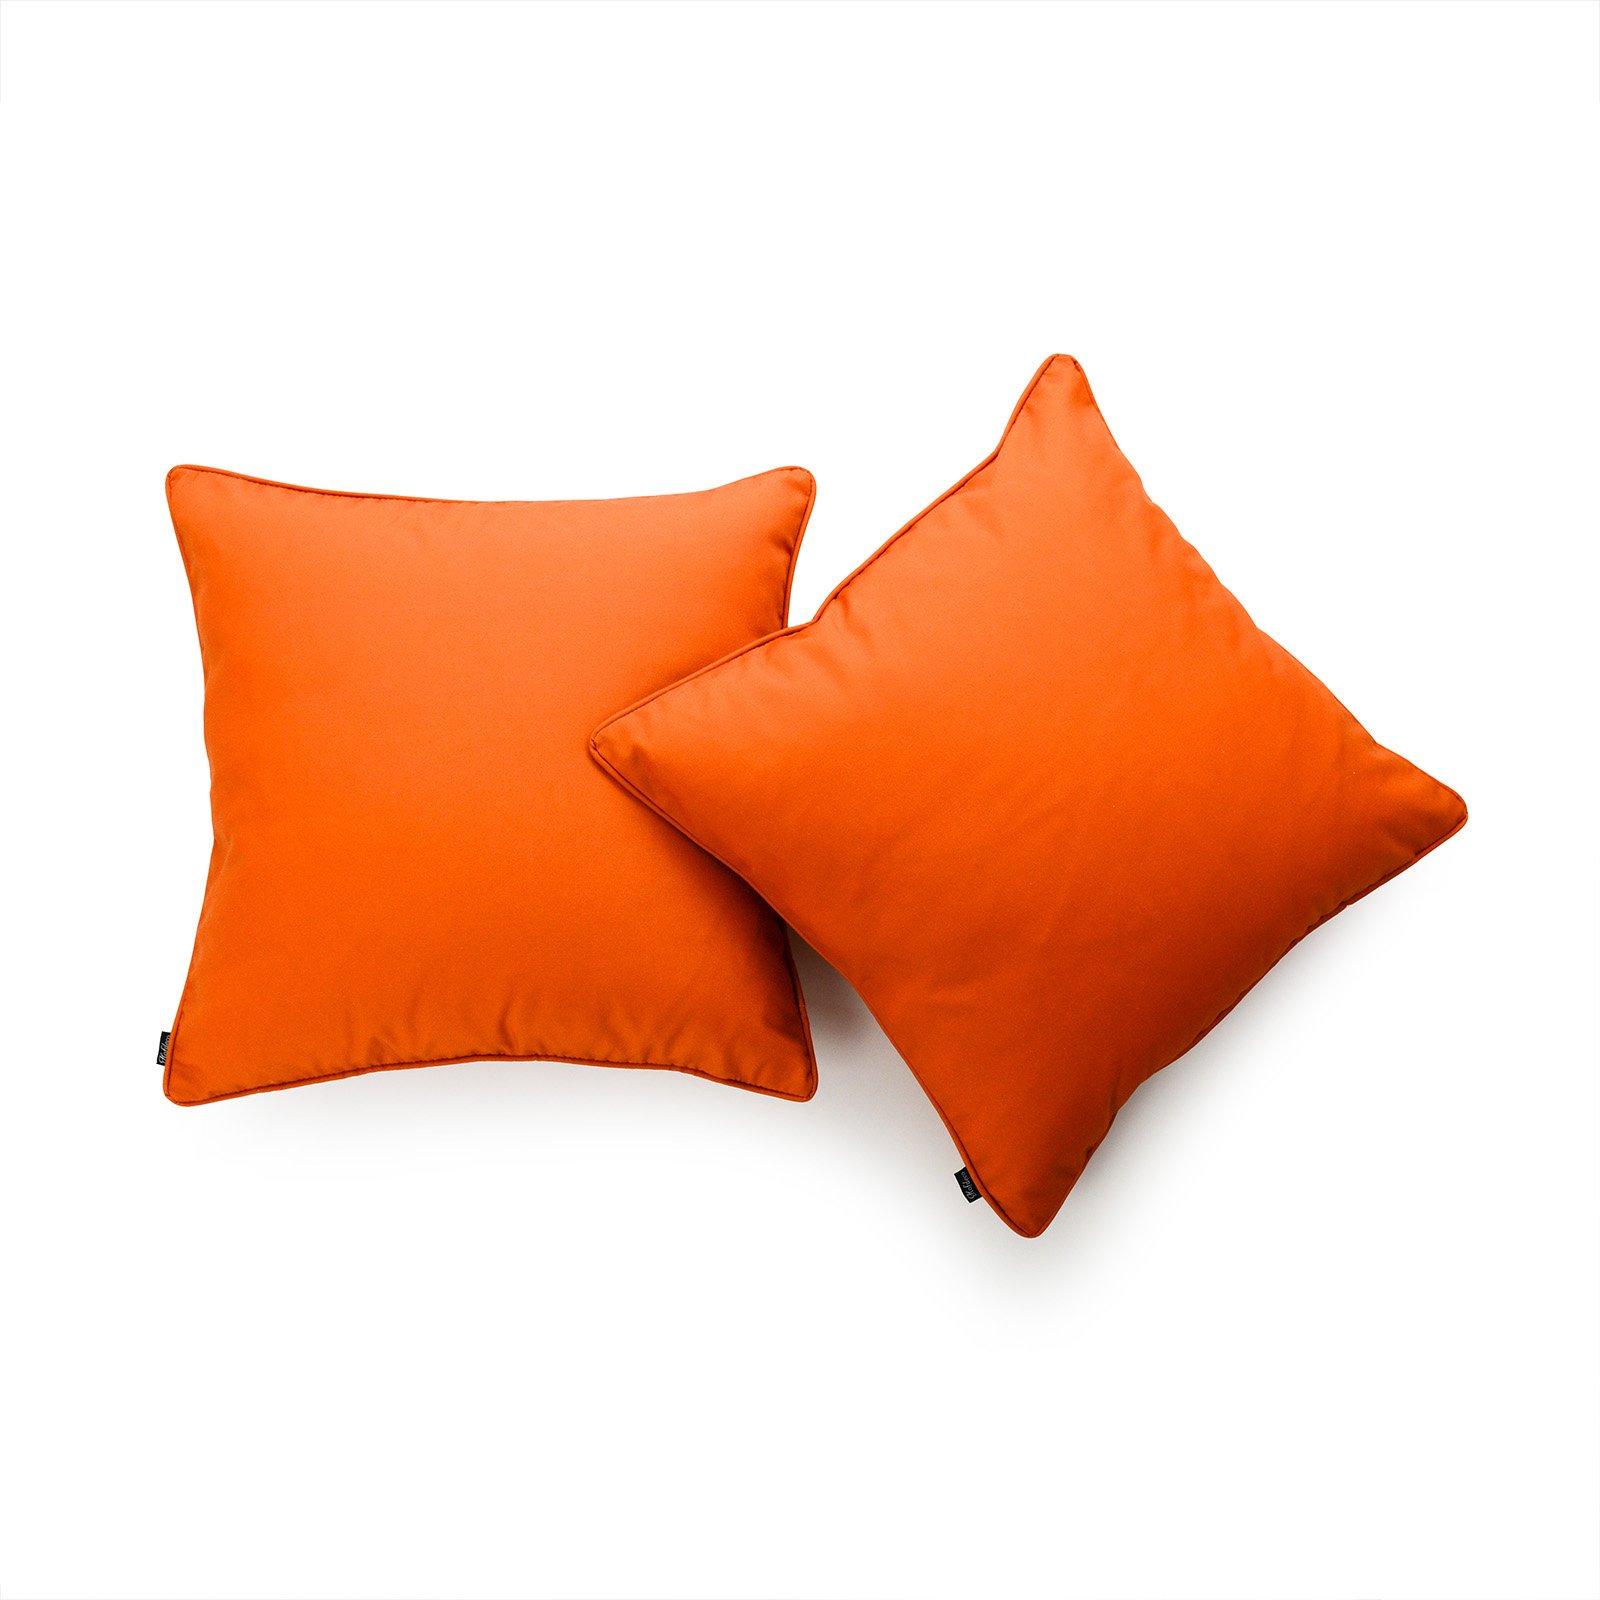 Hofdeco Decorative Throw Pillow Cover INDOOR OUTDOOR WATER RESISTANT Canvas Maple Orange Solid 18''x18'' Set of 2